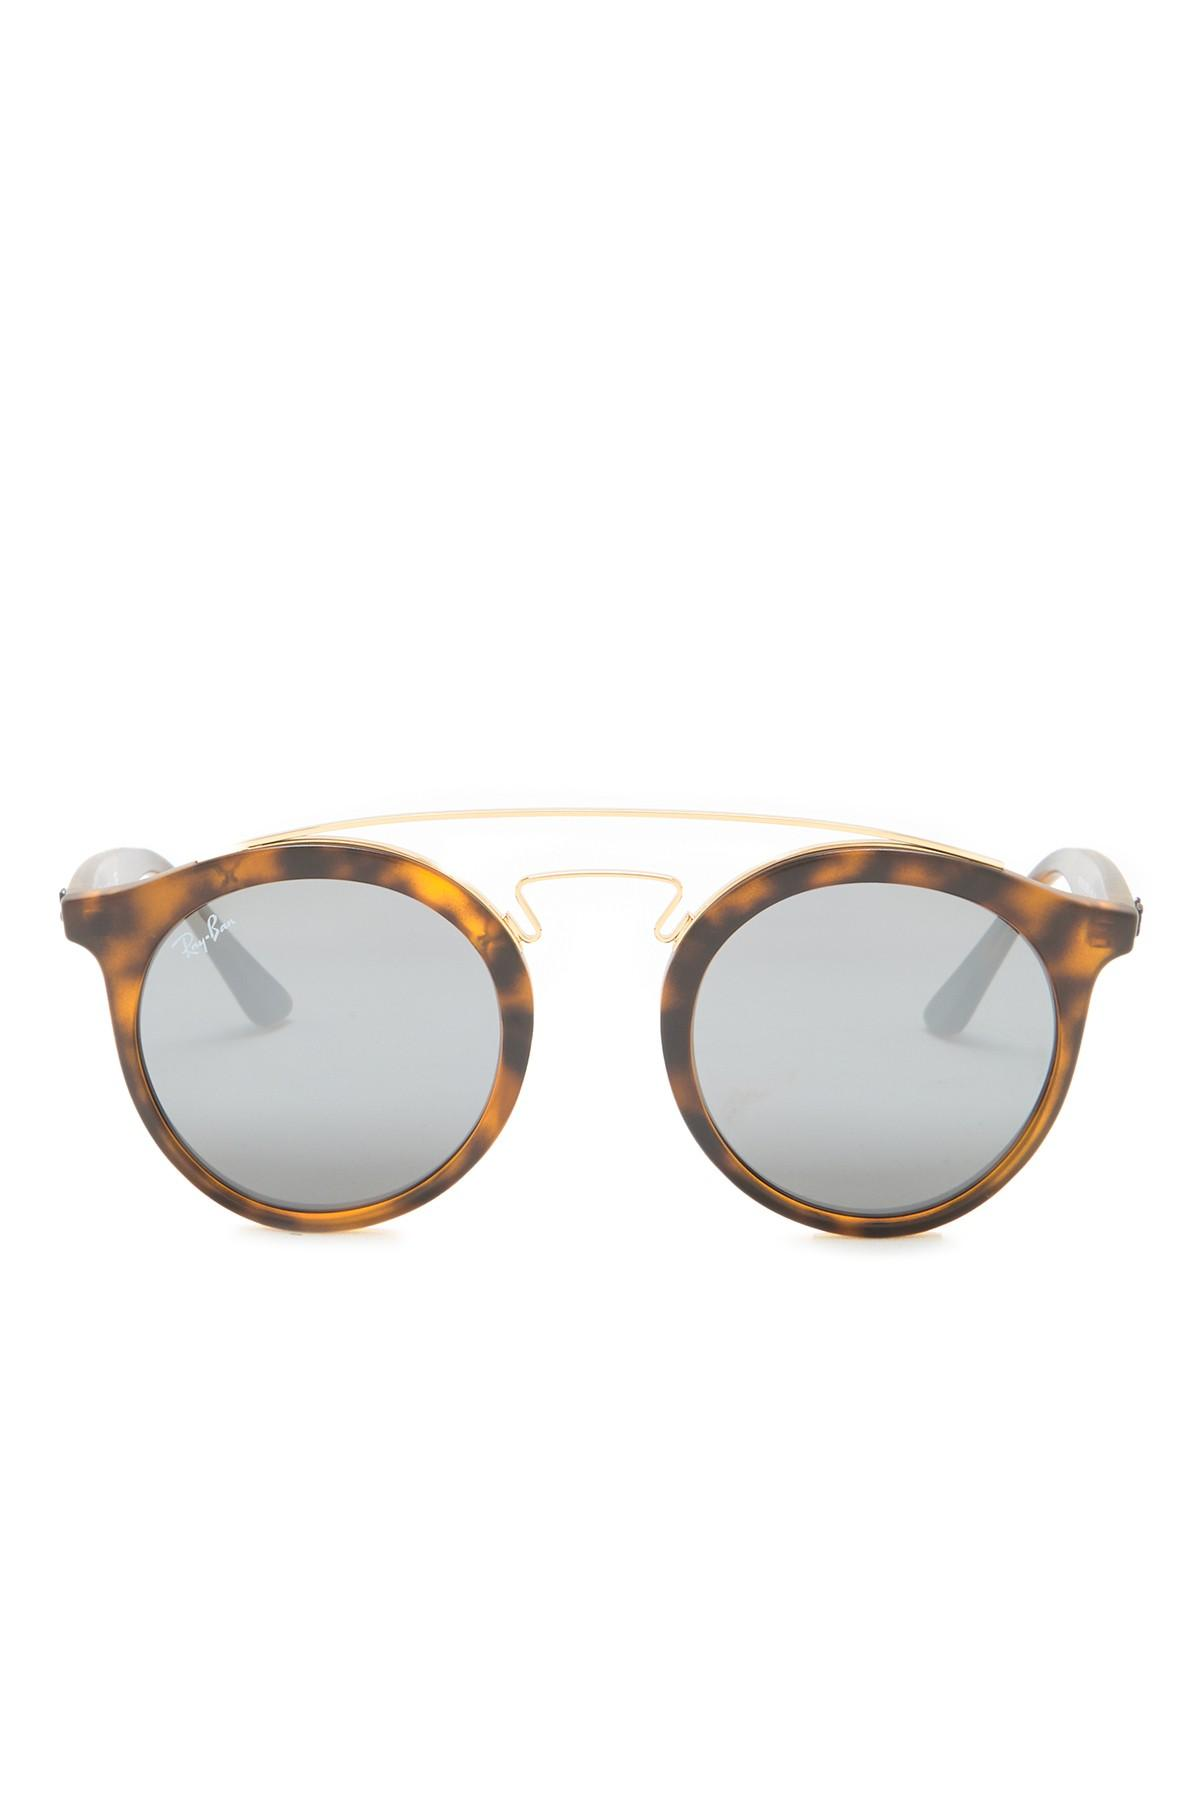 138b6014d2 Lyst - Ray-Ban 46mm Phantos Sunglasses